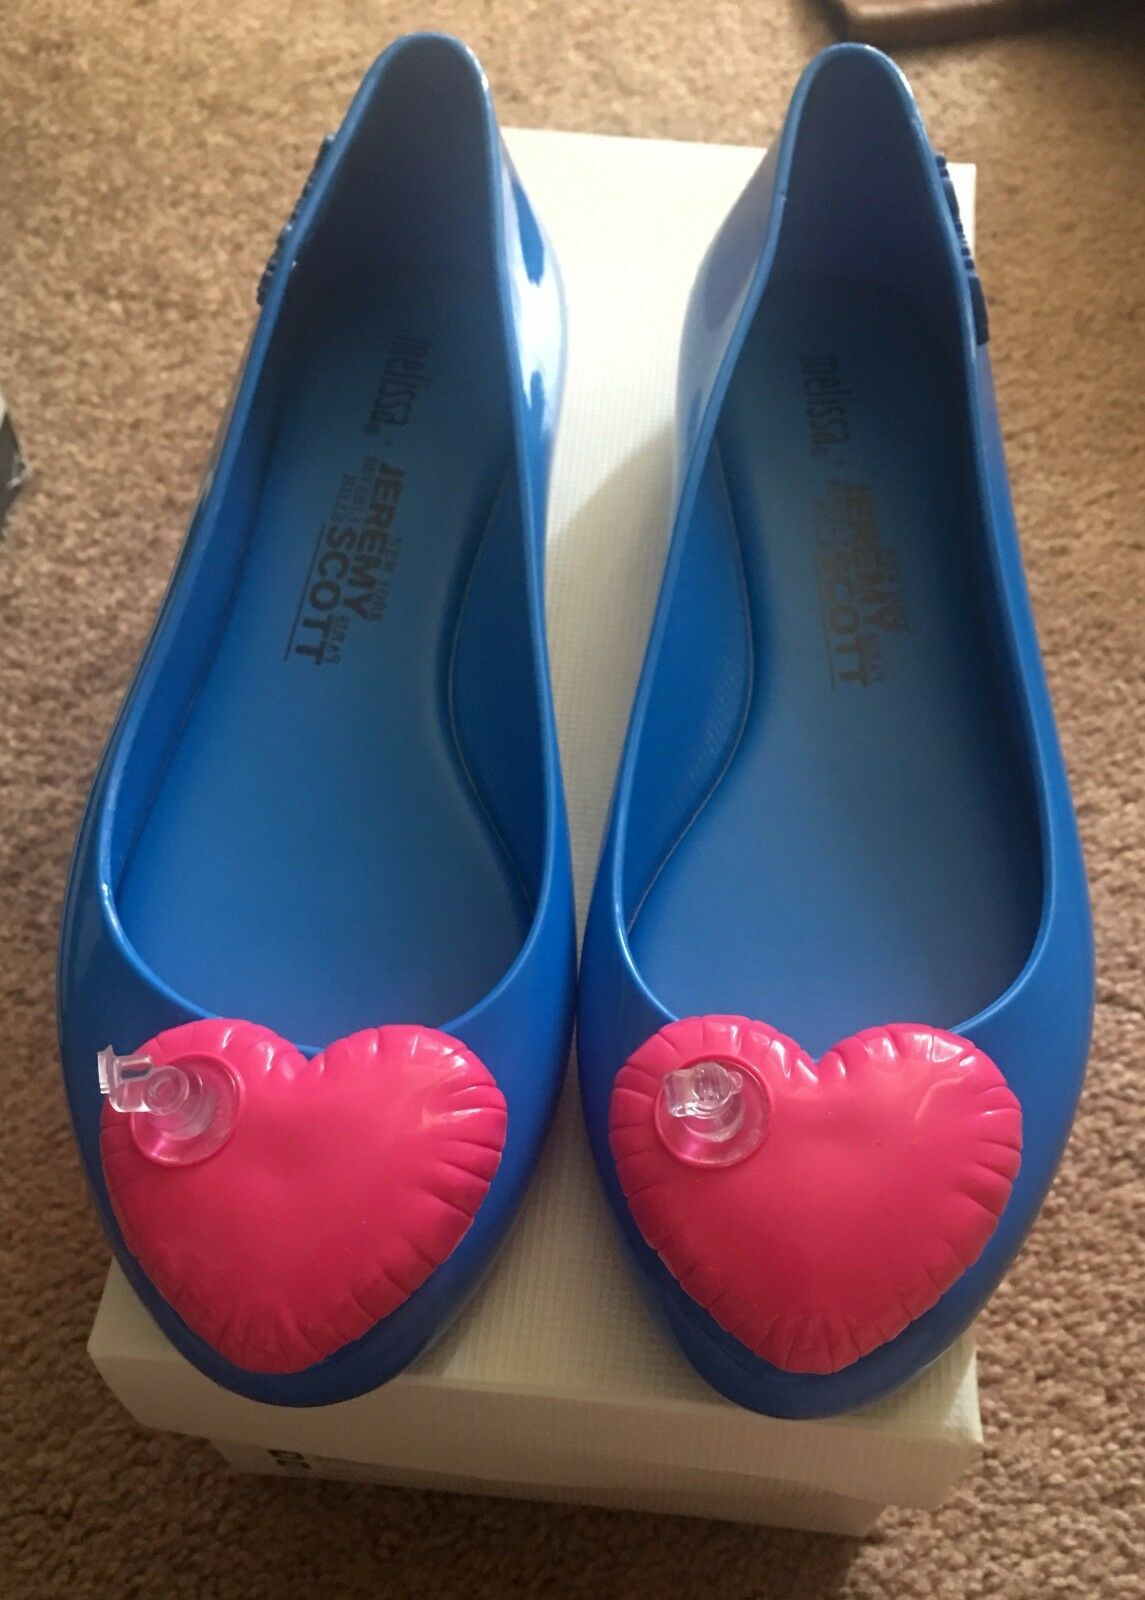 Melissa X Jeremy Scott Blue w/ Heart Shoes Flats size 8